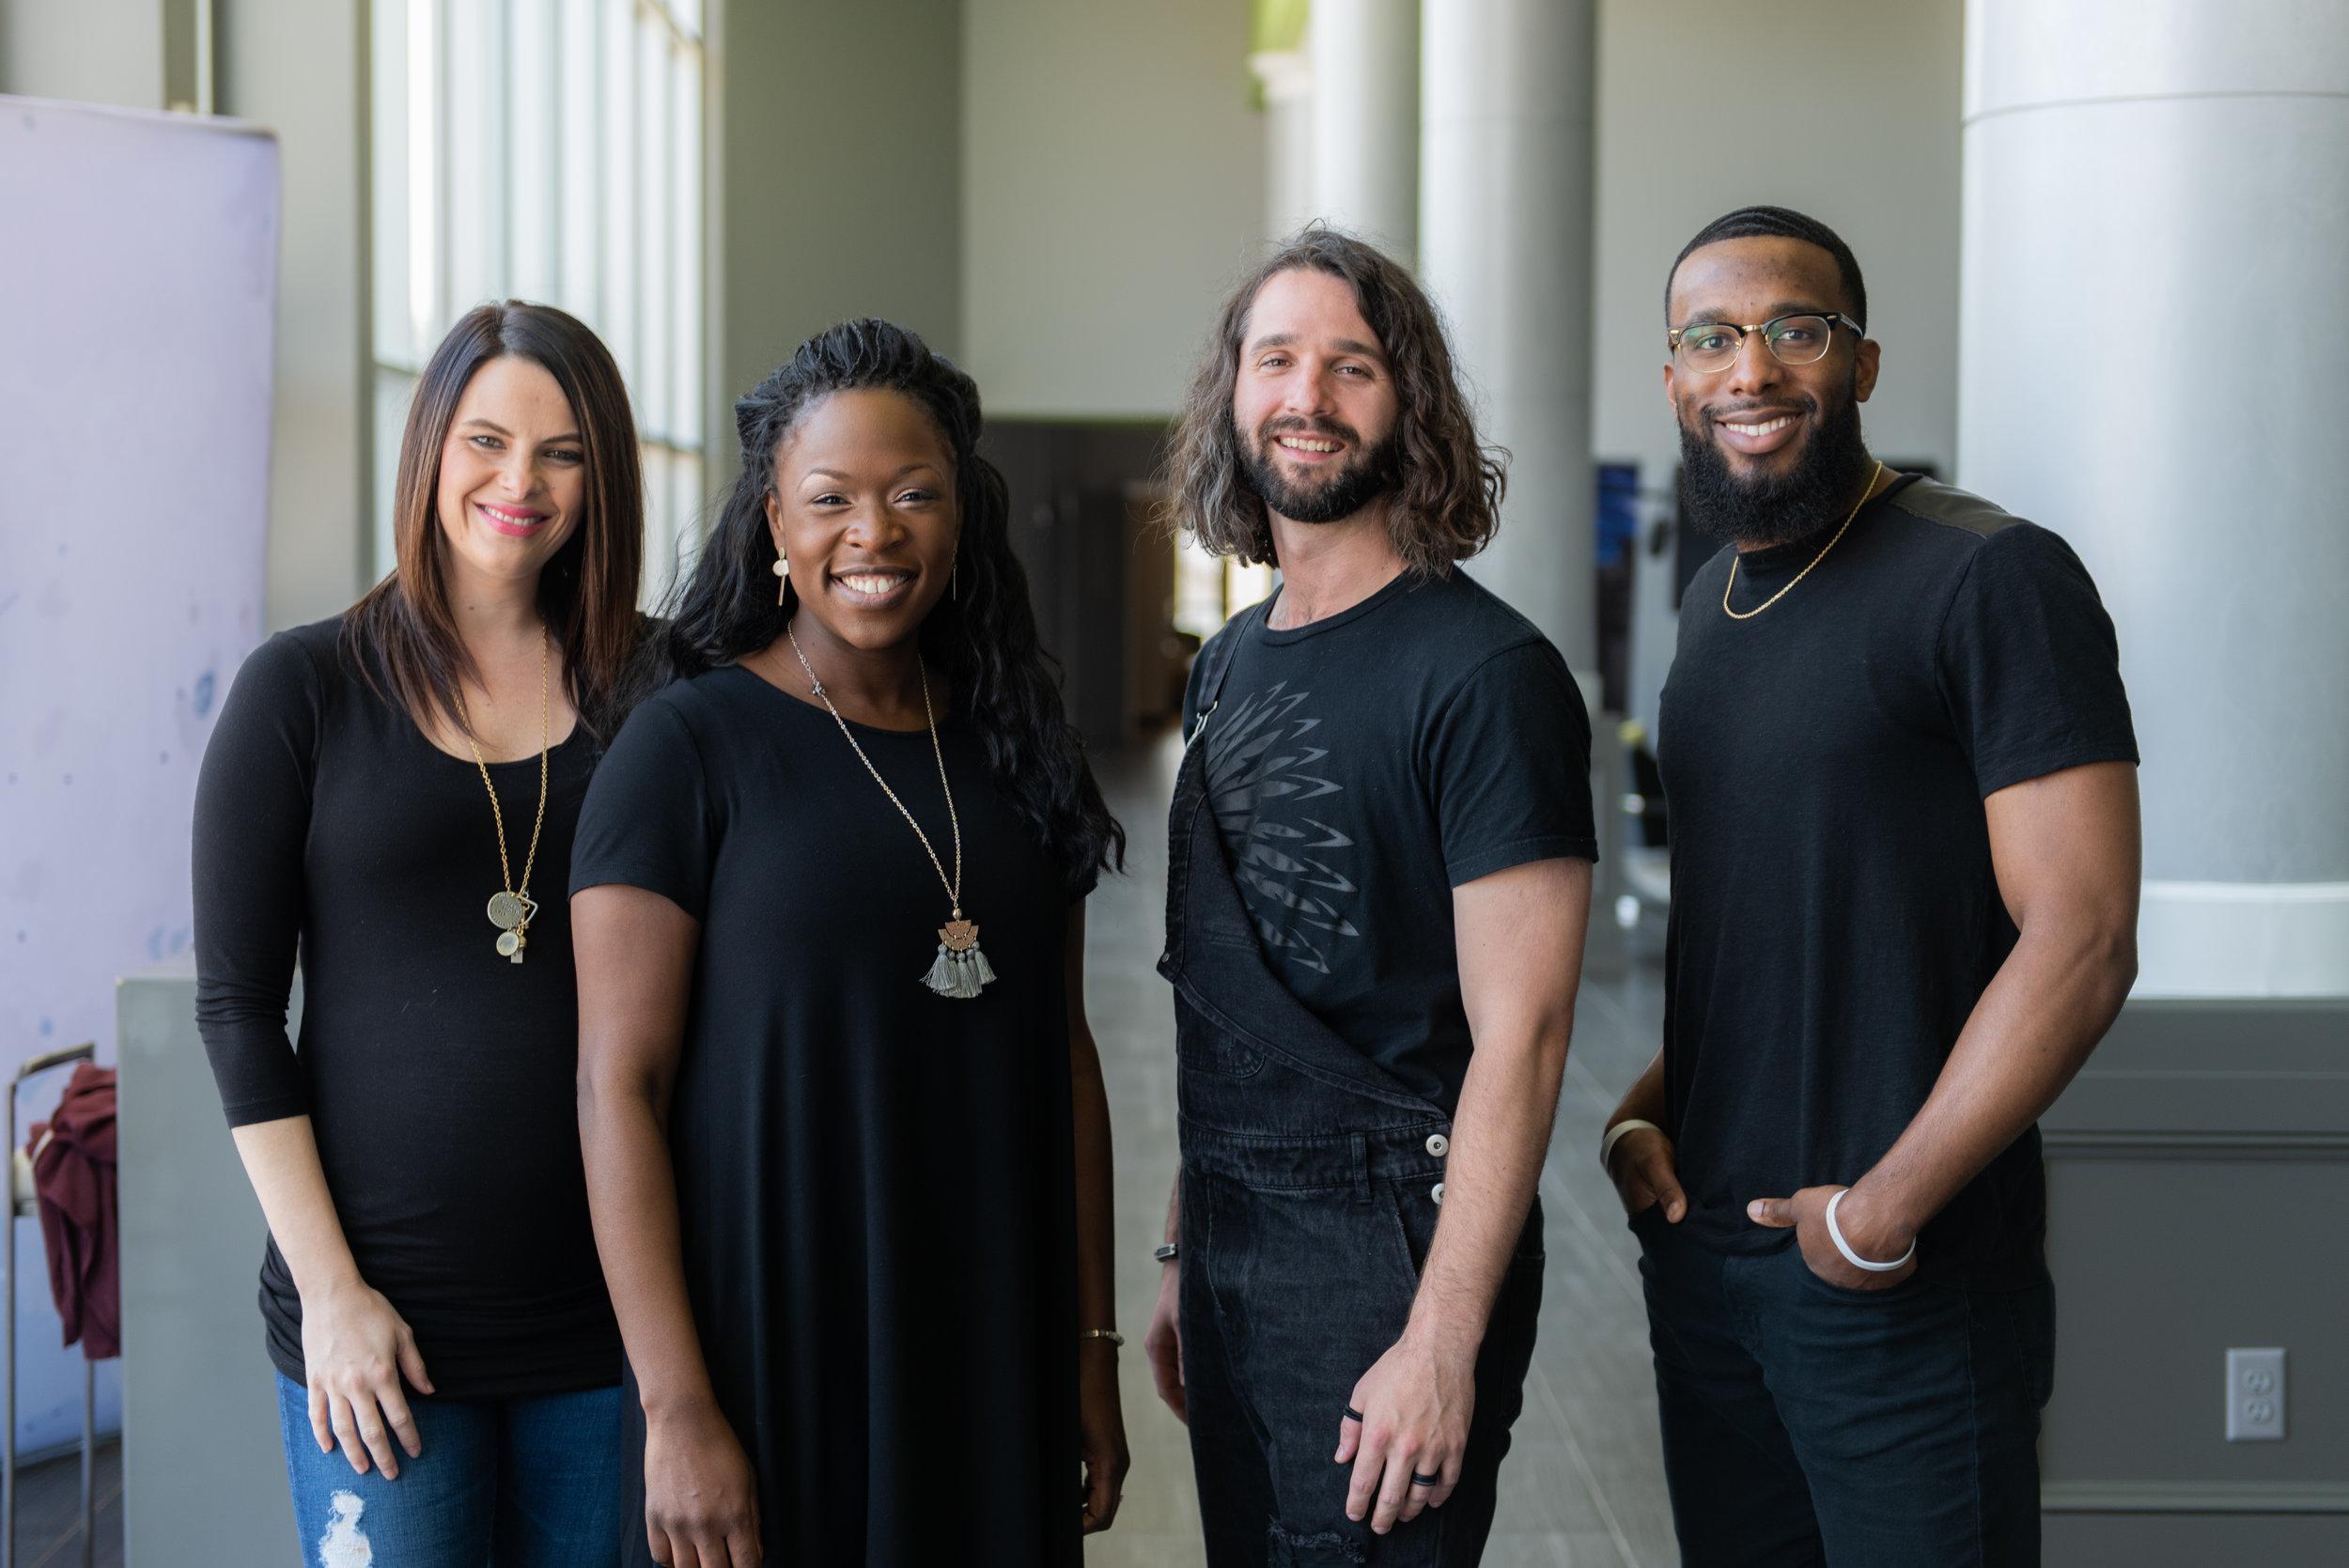 Lacey, Jojo, Tobin and Lebron Worship Team